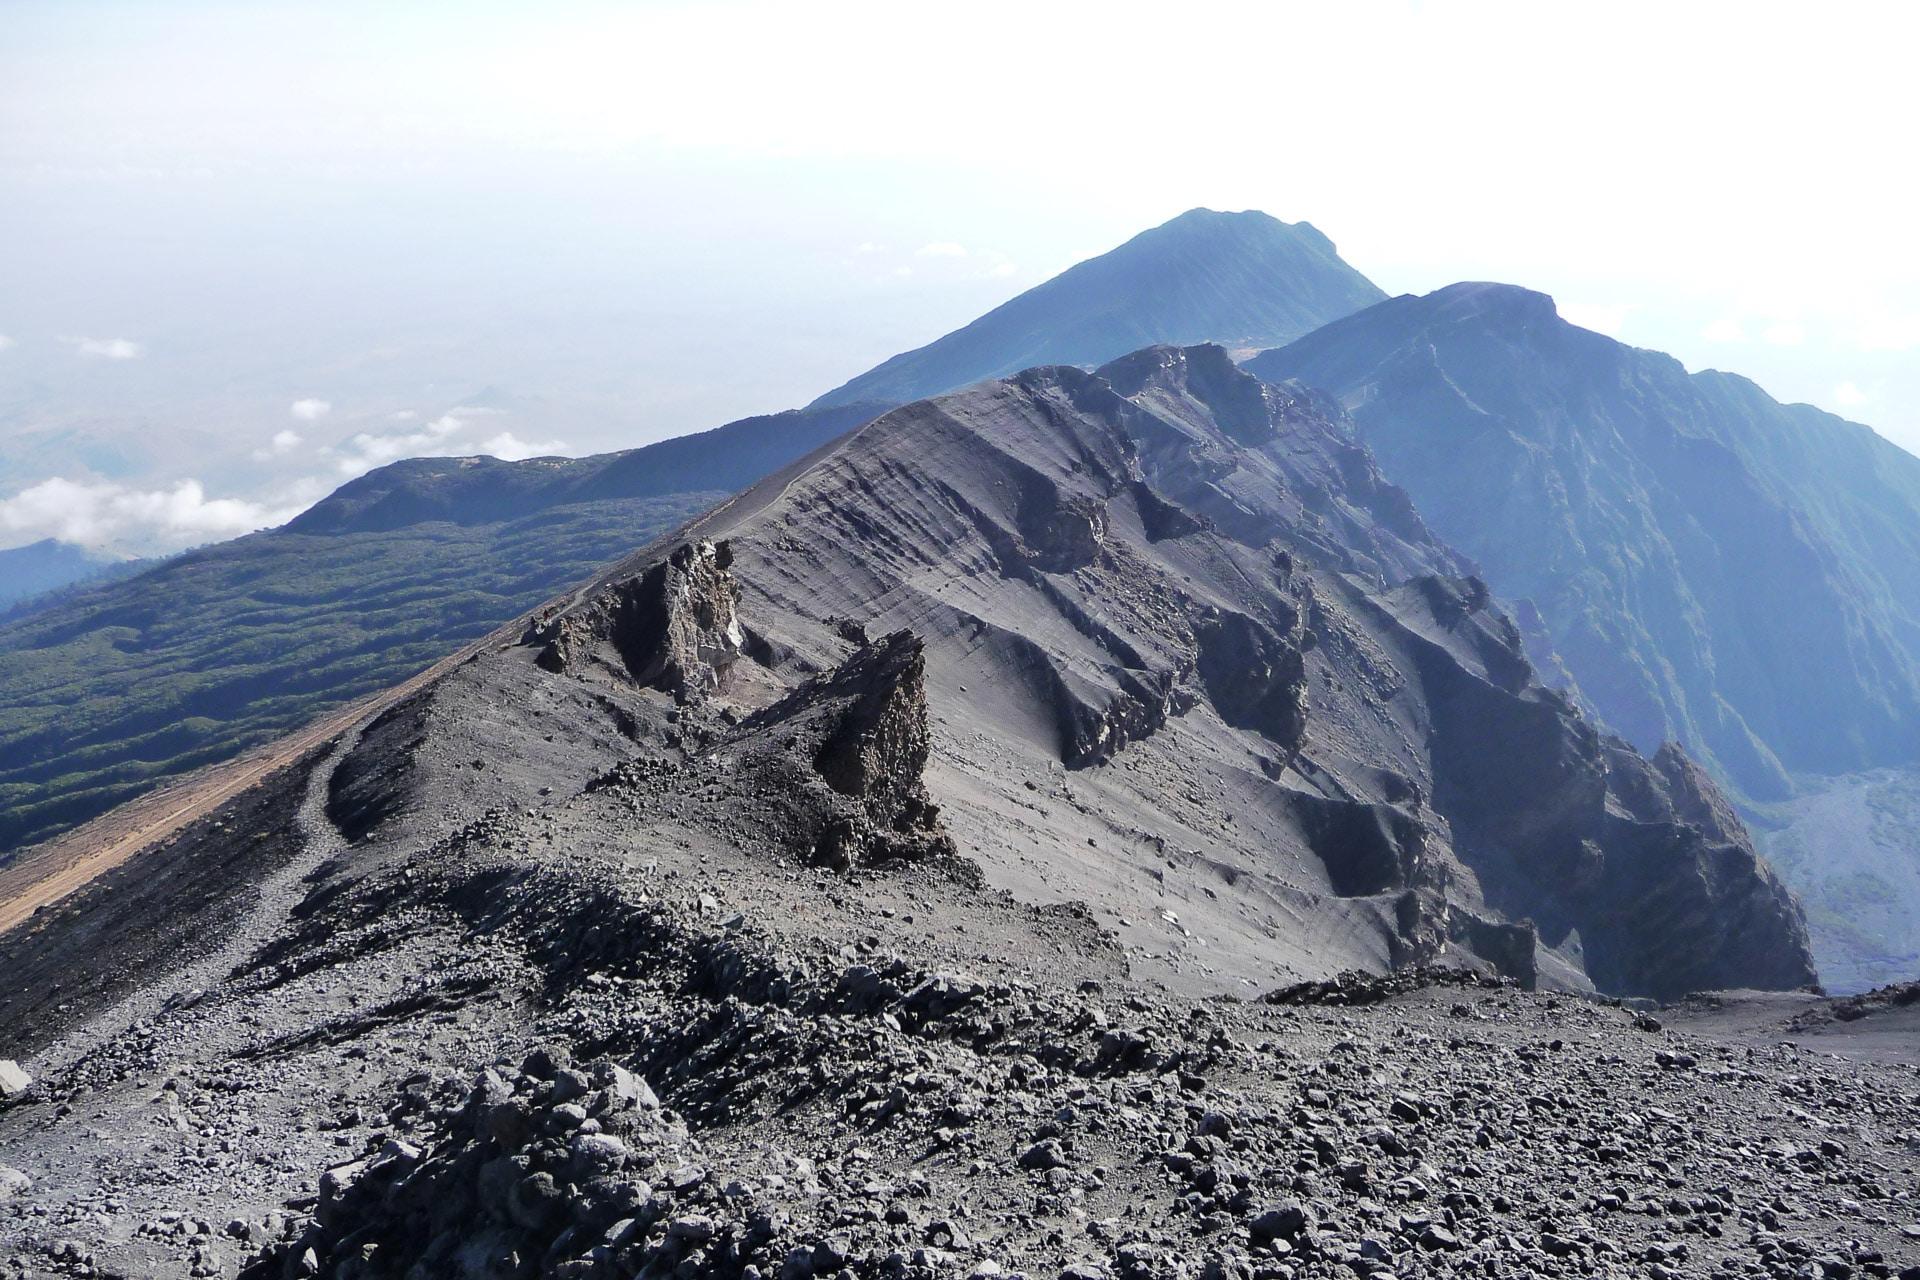 Mount-Meru-Arusha-Nationalpark-Tansania-Globetrotter-Select-Boehm-45